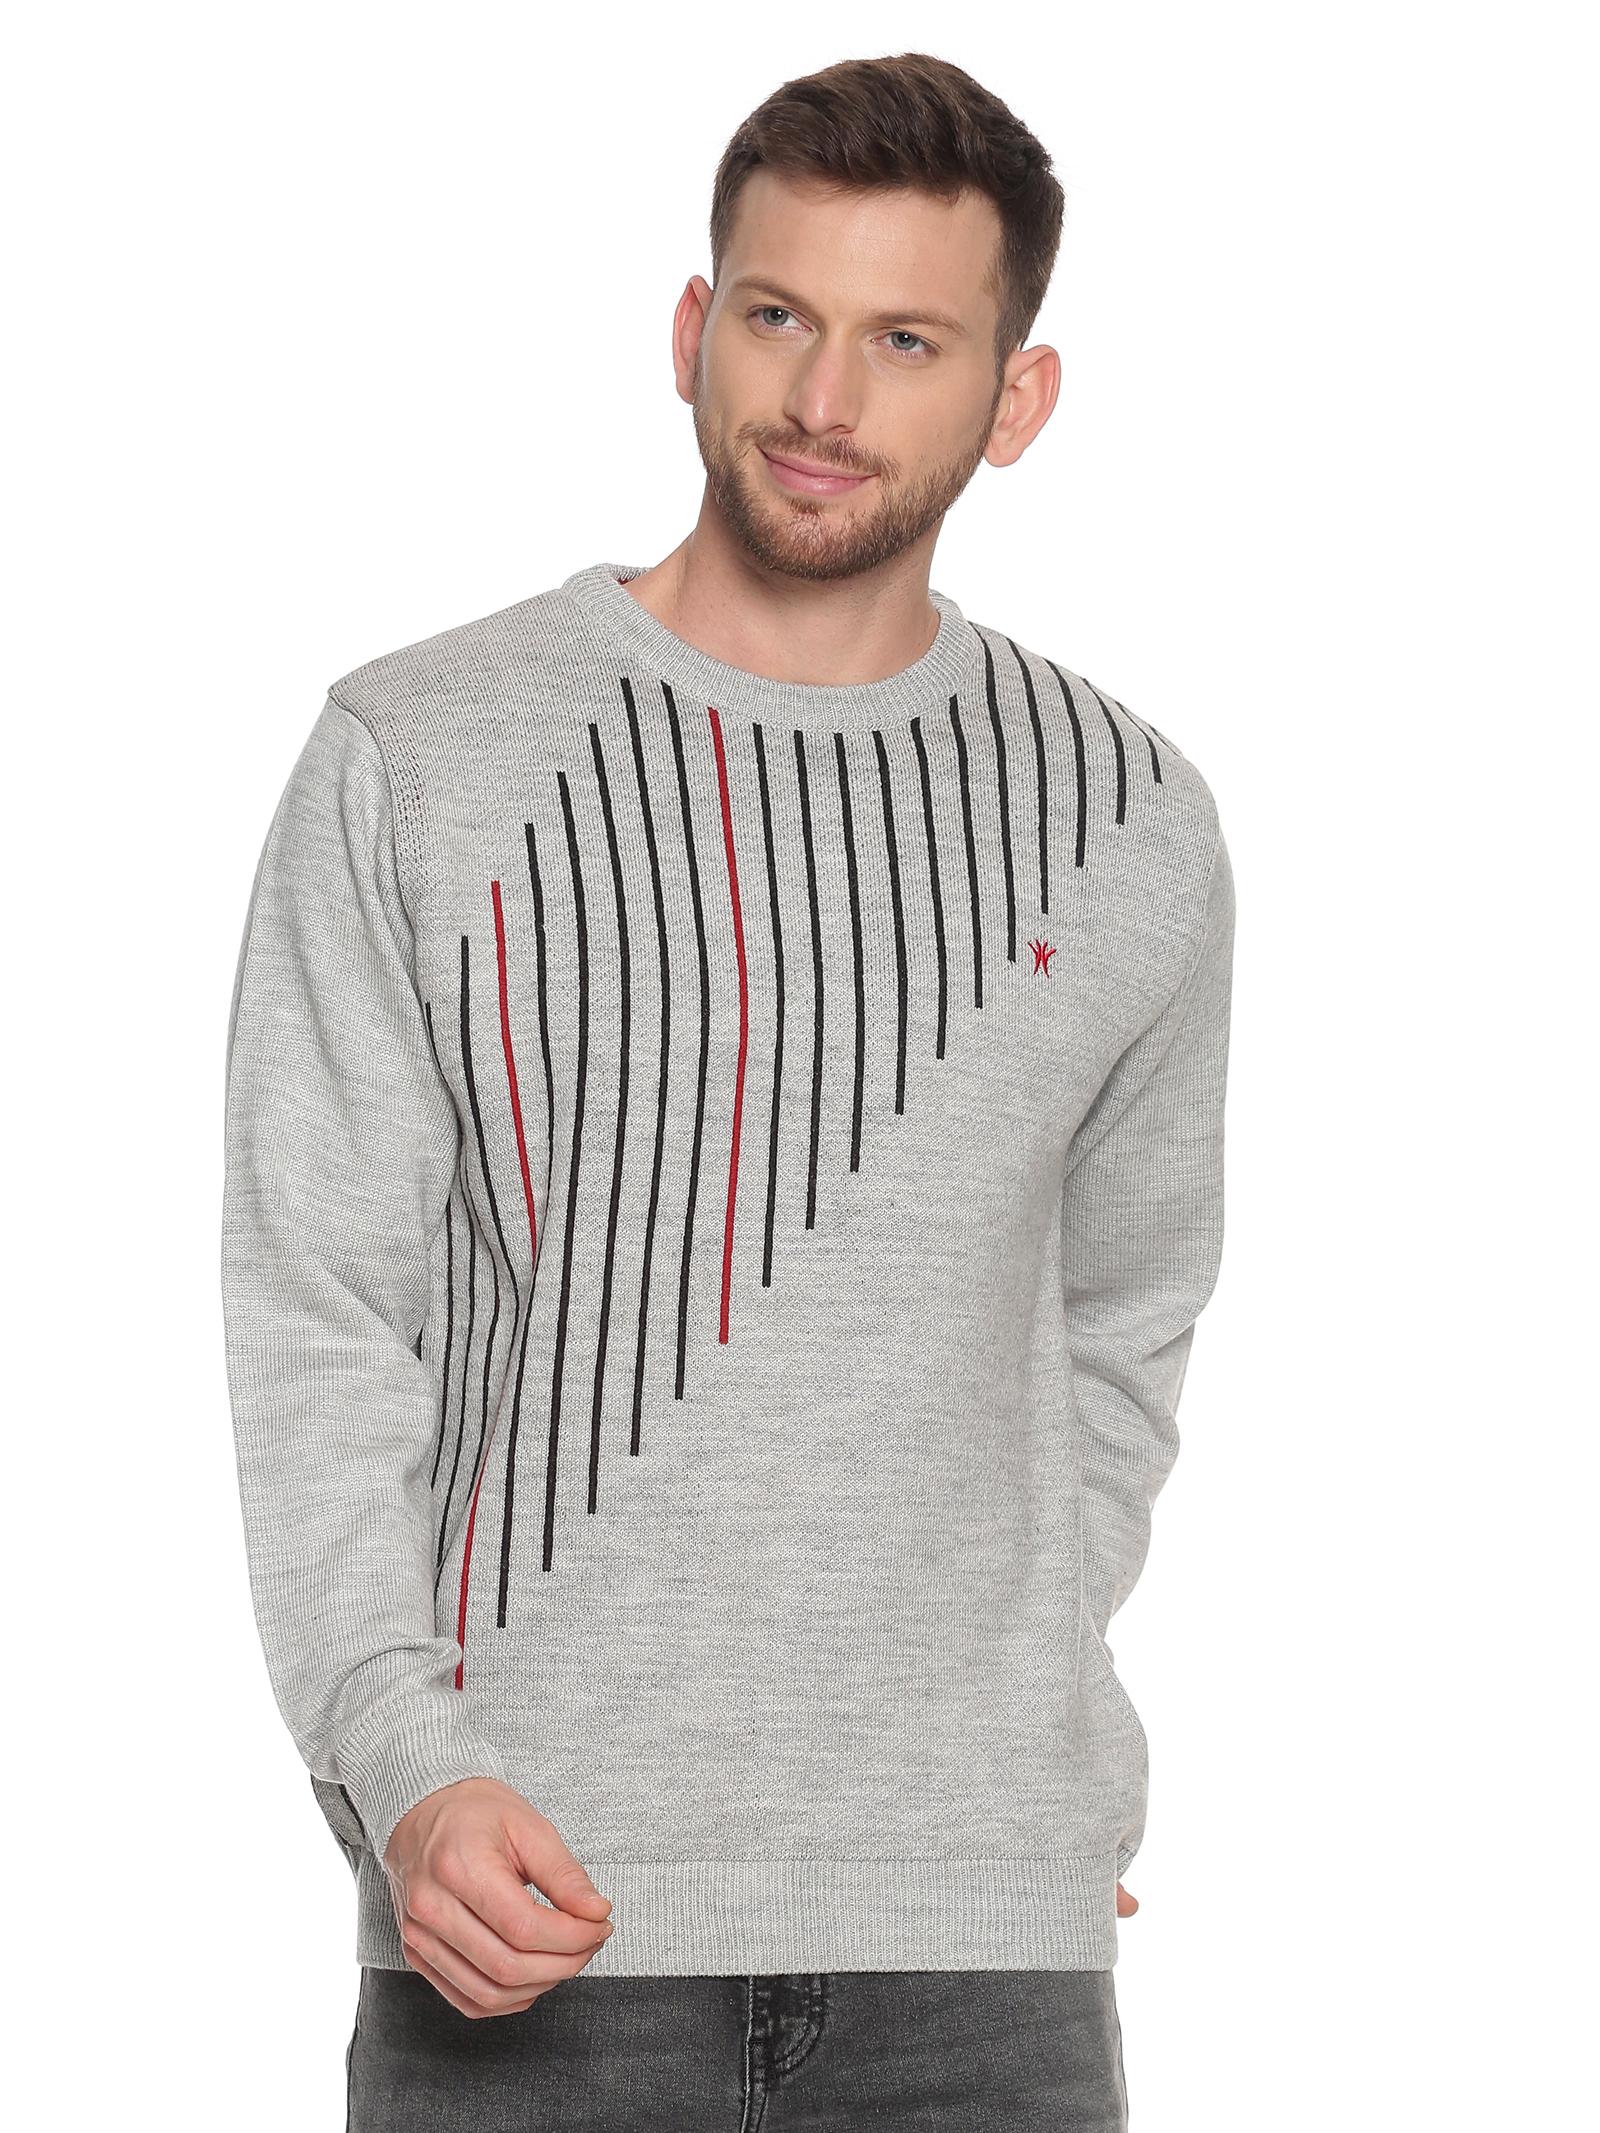 VENITIAN | Venitian Mens Self Design Round Neck  Acrylic Blend Ecru Sweater